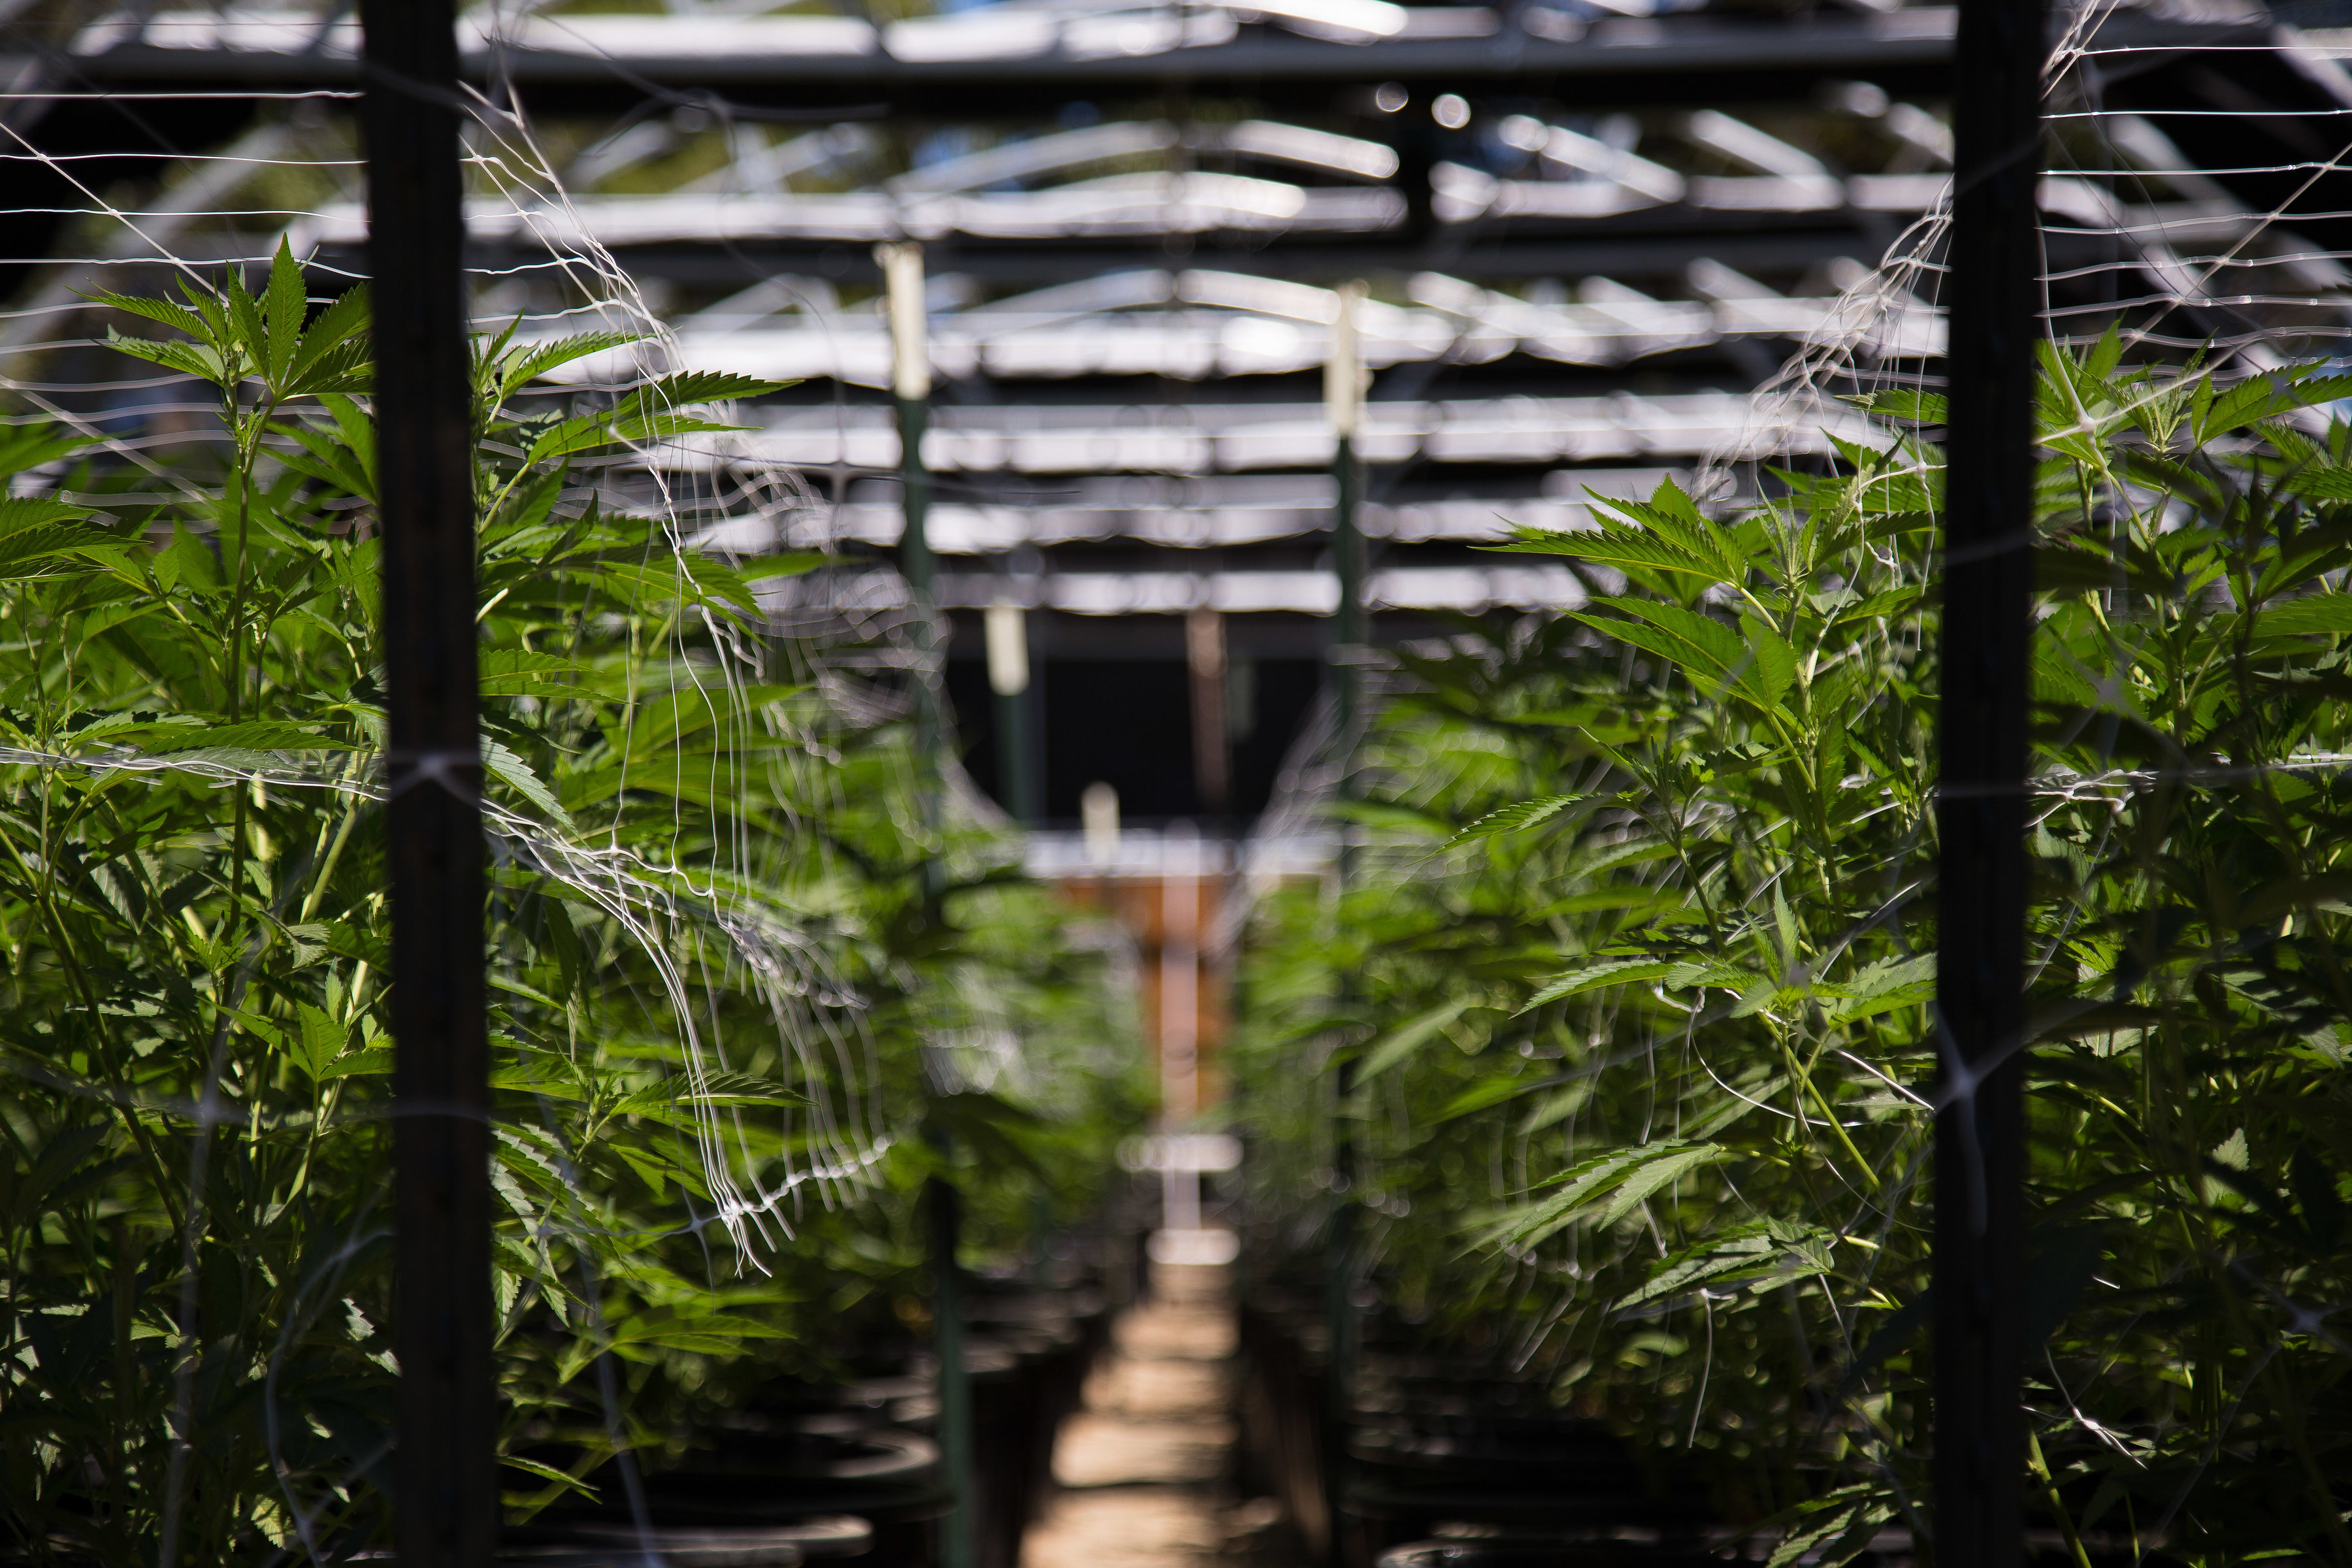 A close-up view of a marijuana farm. Shutterstock image via Ryland zweifel